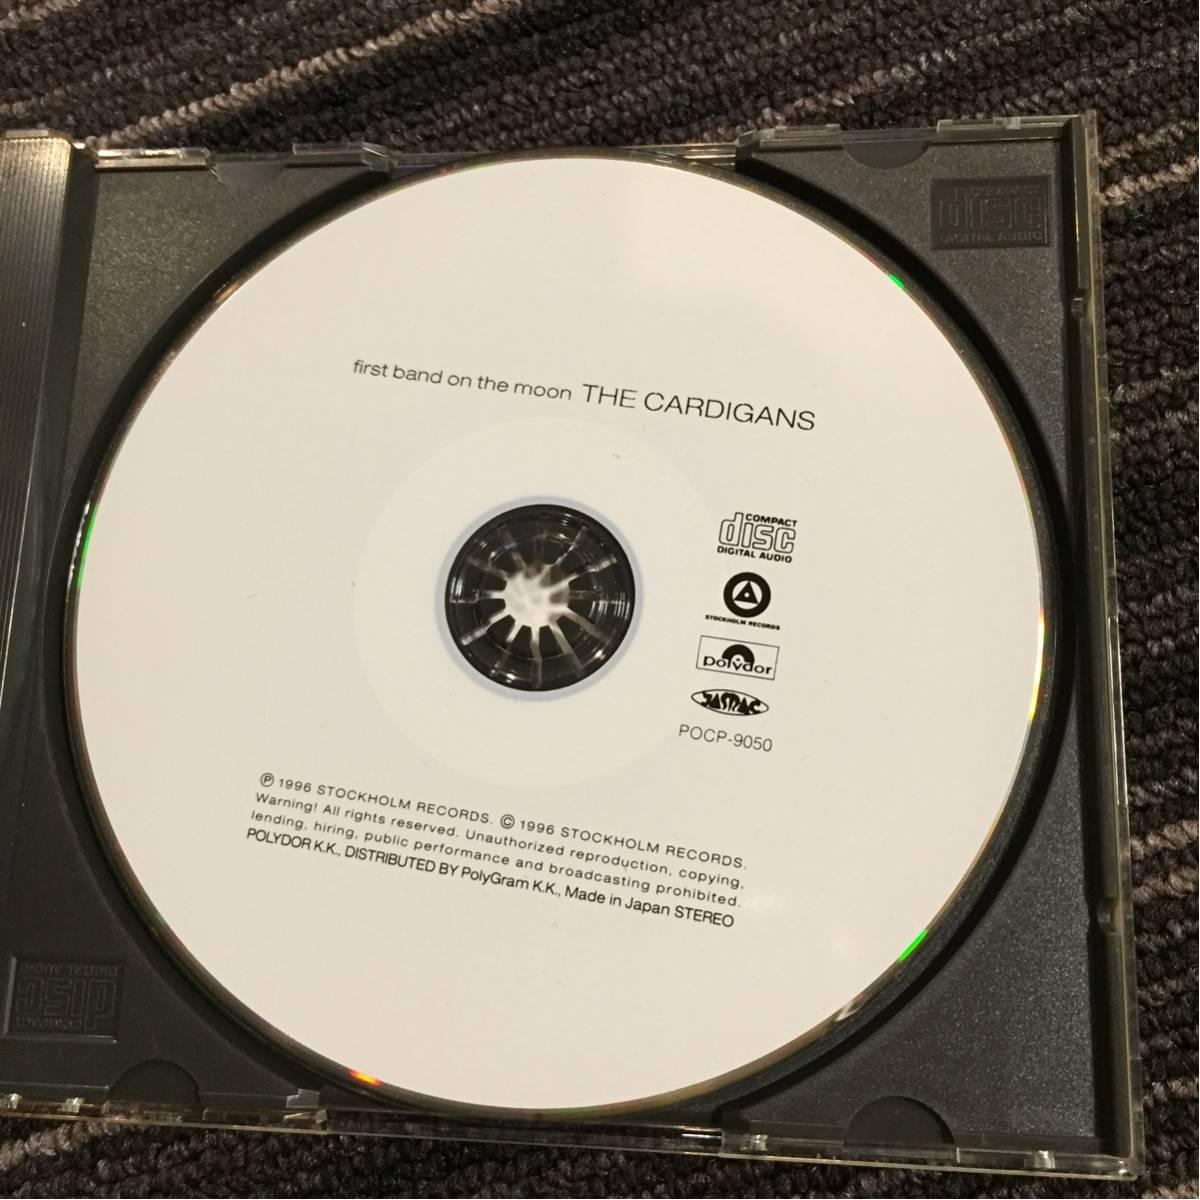 THE CARDIGANSカーディガンズ/ FIRST BAND ON THE MOONファースト・バンド・オン・ザ・ムーン_画像3